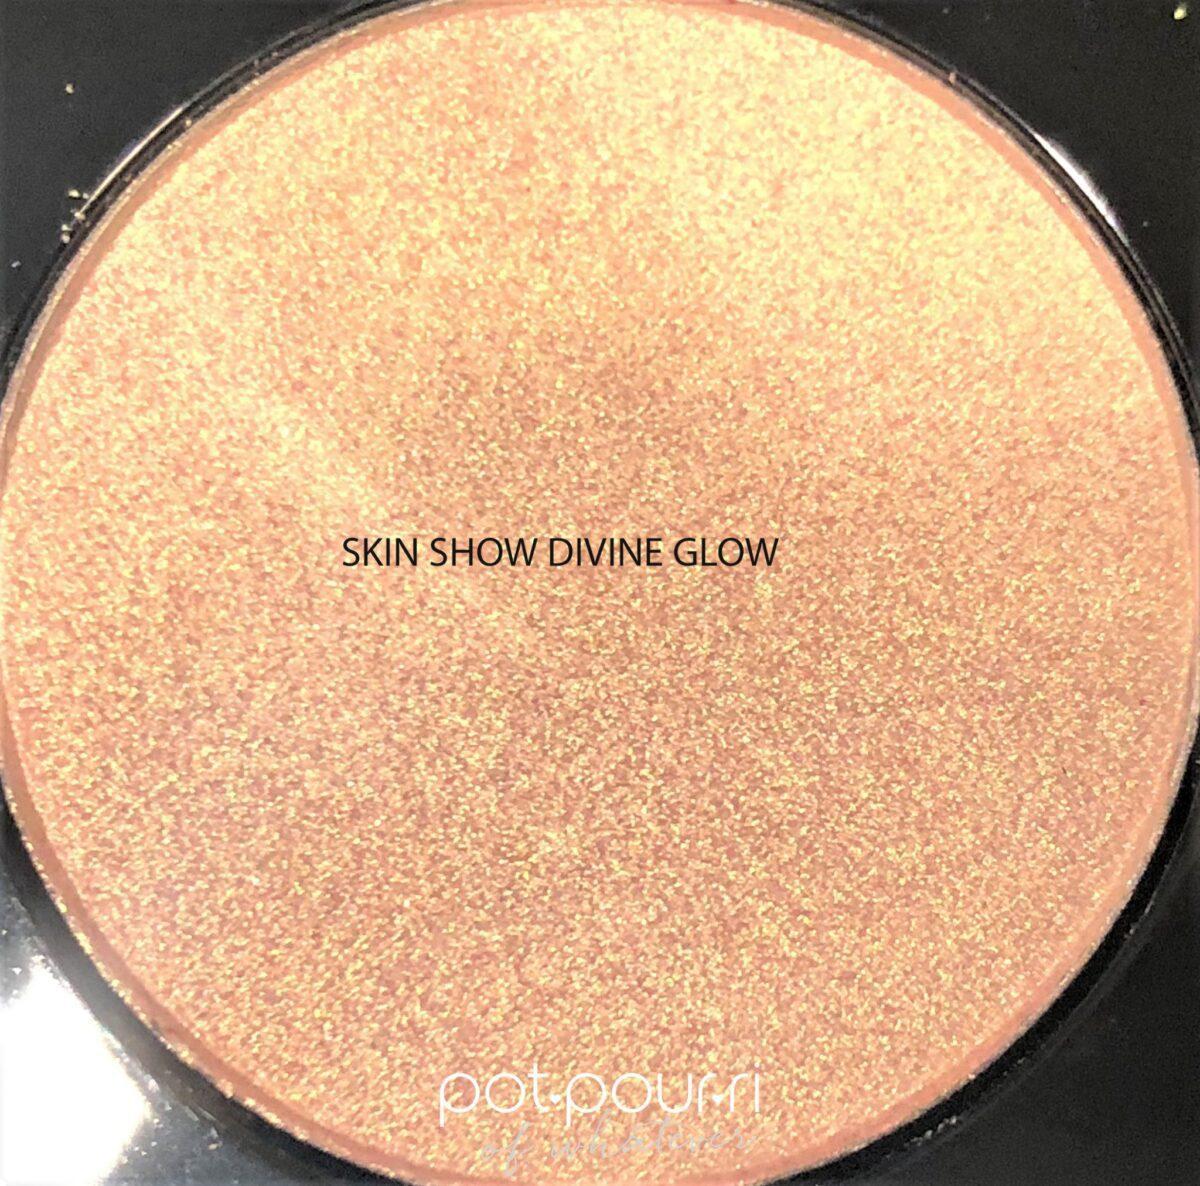 SKIN SHOW DIVINE GLOW